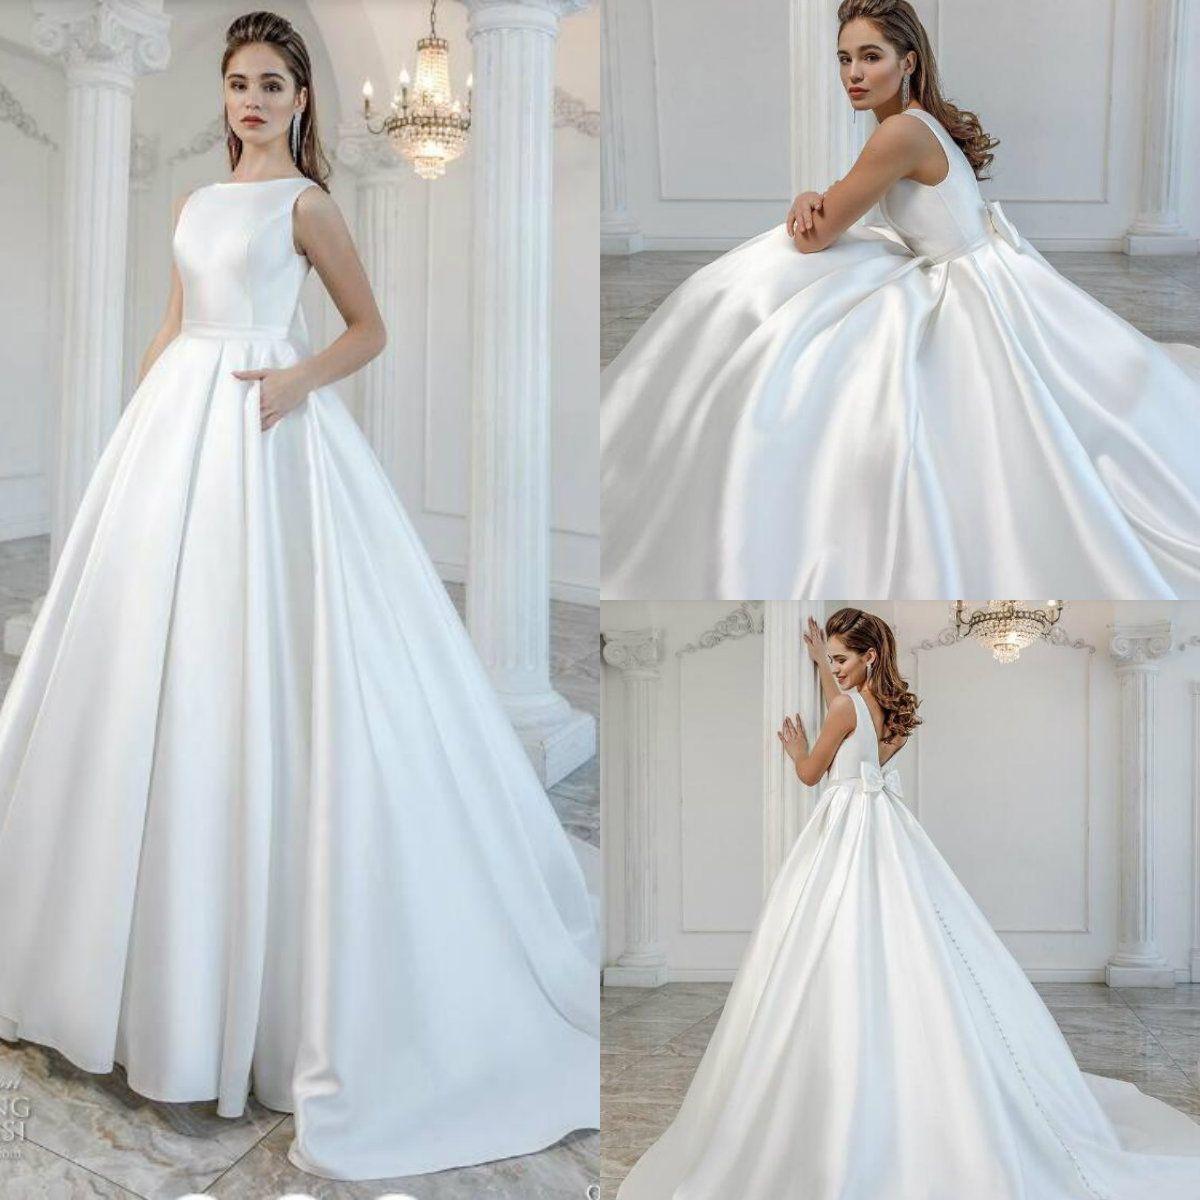 cb0b0788b94 Discount 2019 Plus Size Wedding Dresses Sleeveless Elastic Satin Bow  Backless Beach Wedding Dress Robe De Mariée Summer Boho Bridal Gowns Cheap Gowns  Plus ...